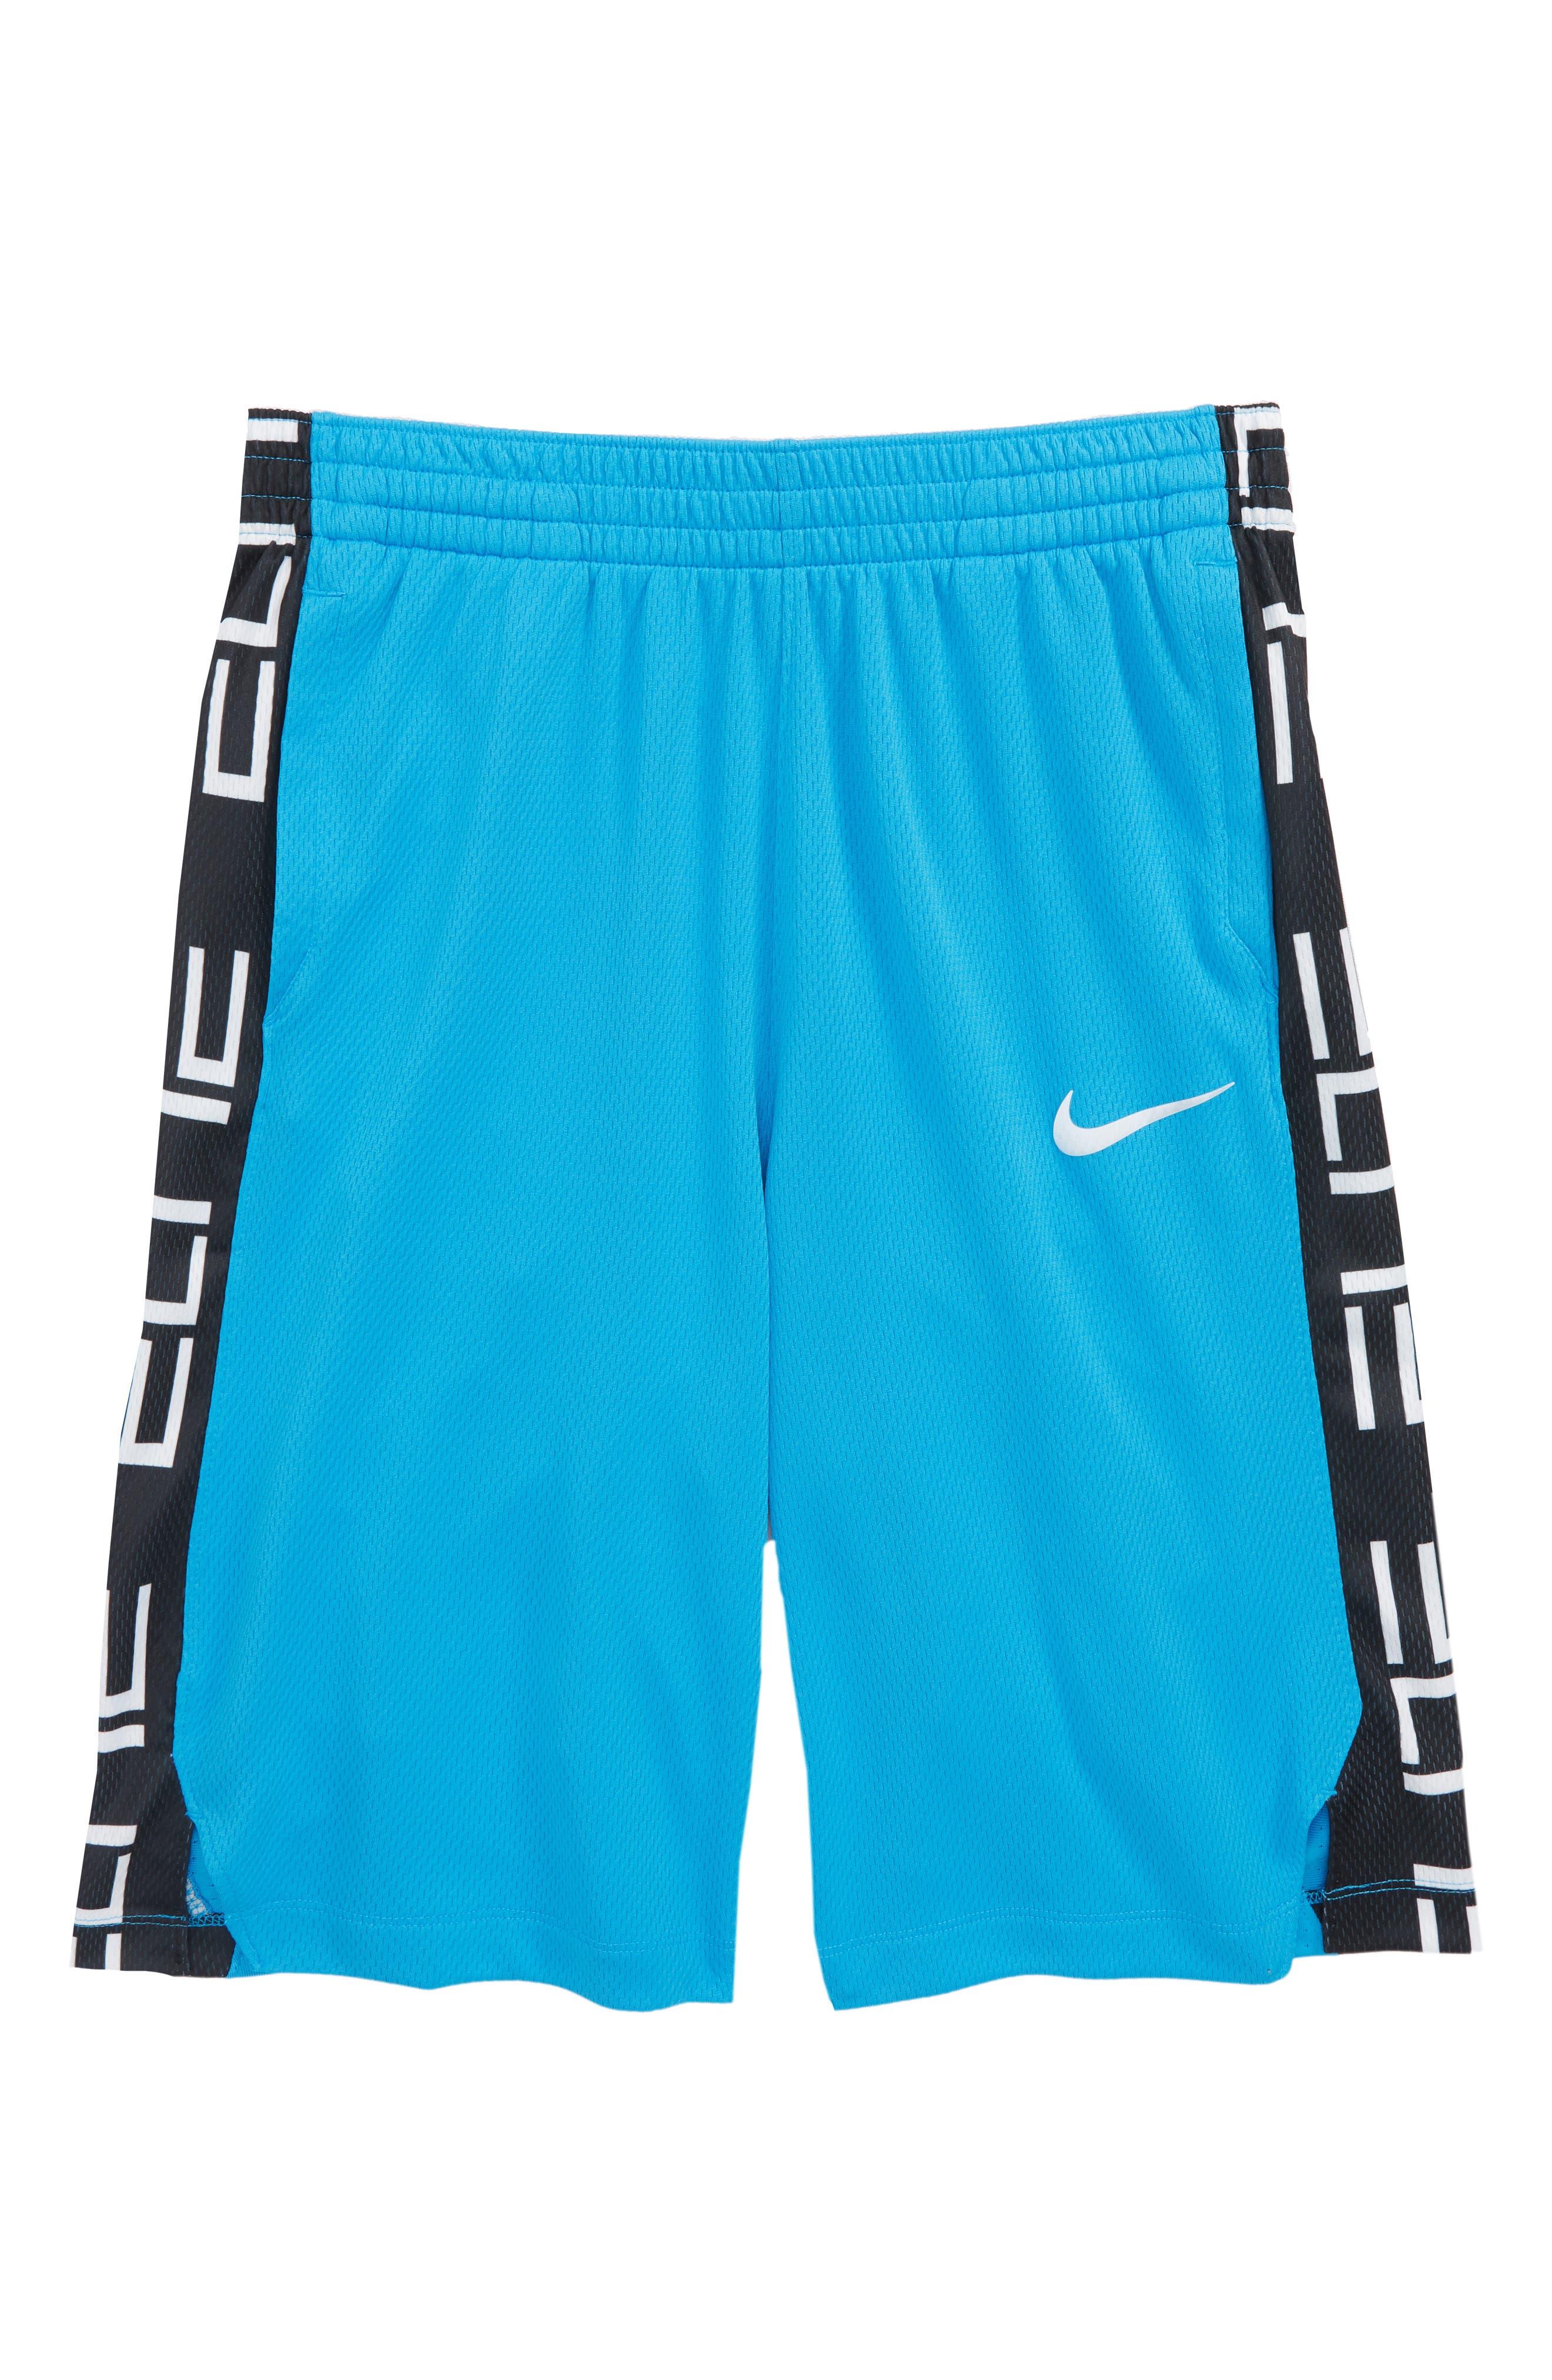 Dry Elite Shorts,                         Main,                         color, 482